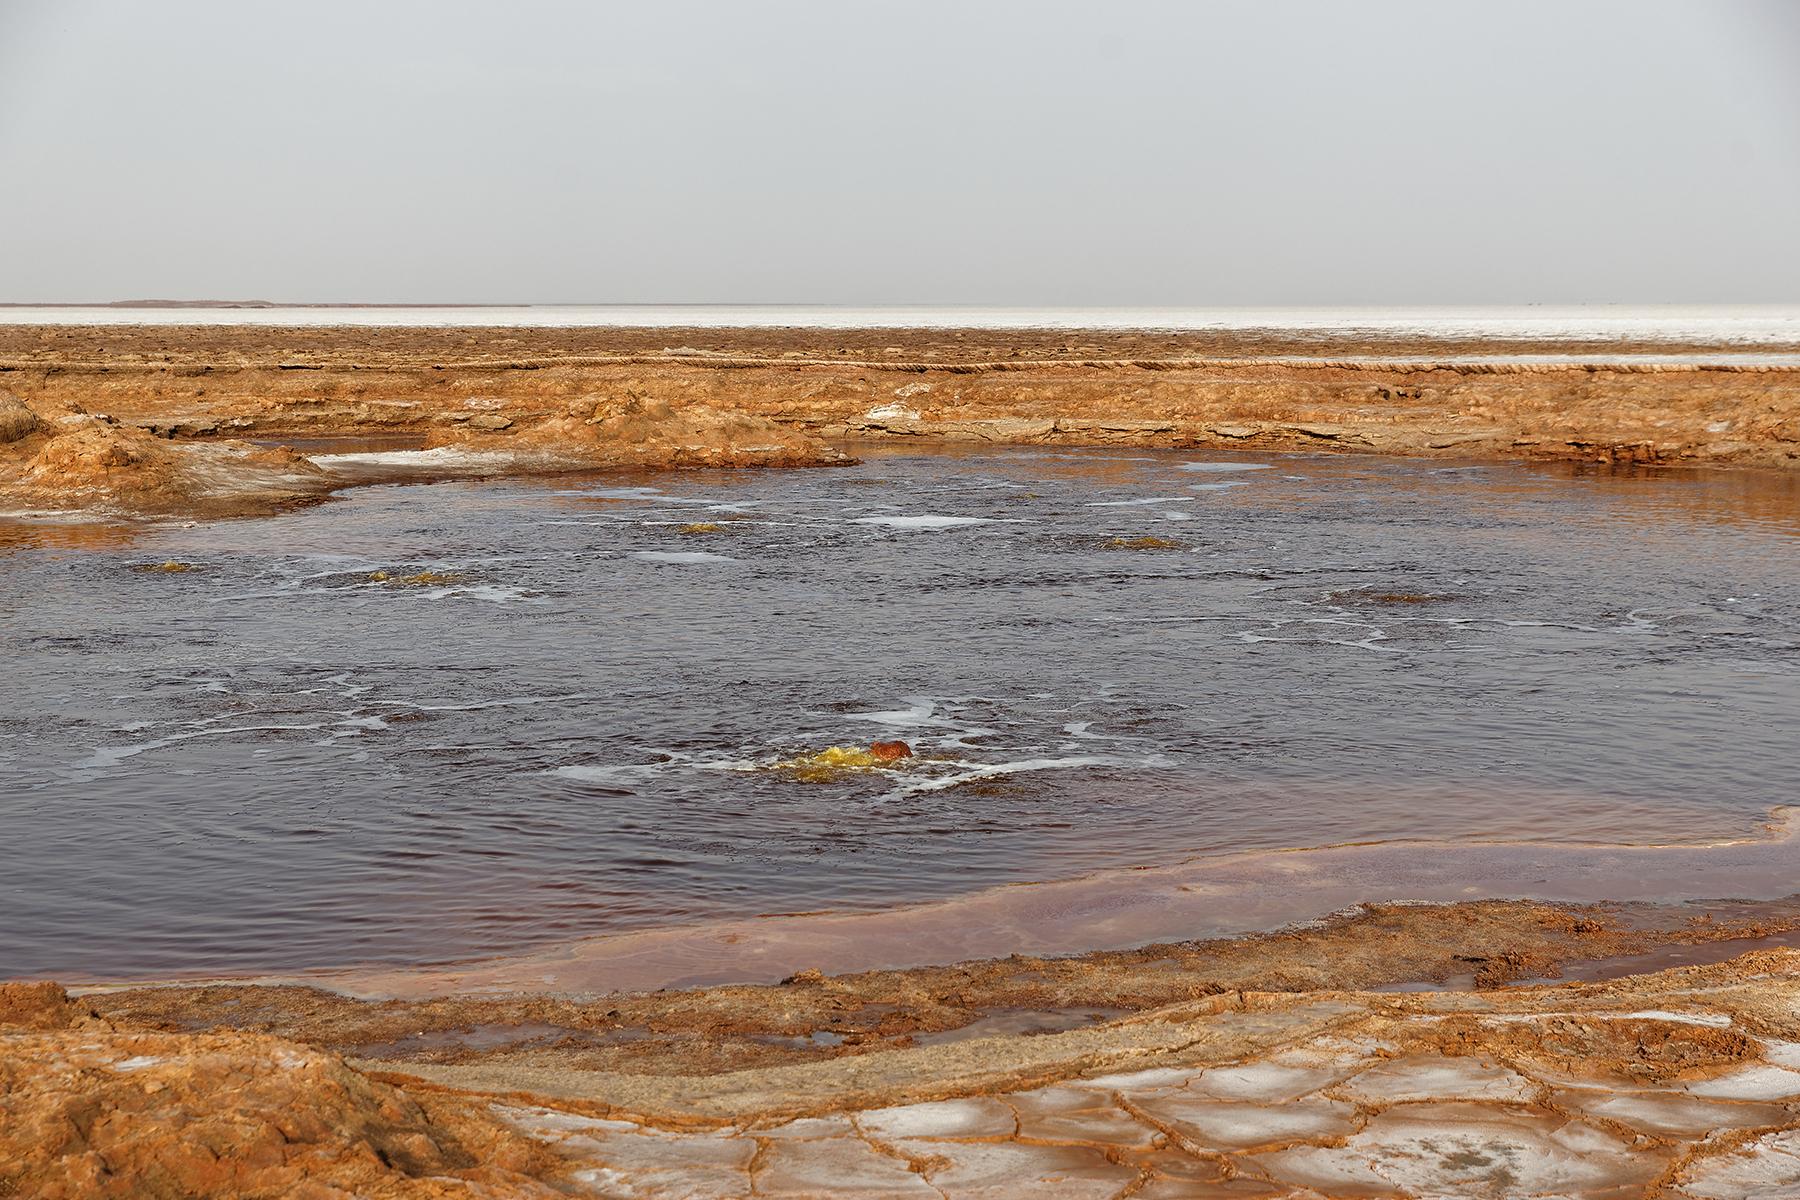 Ethiopie Dallol lac de sel 3